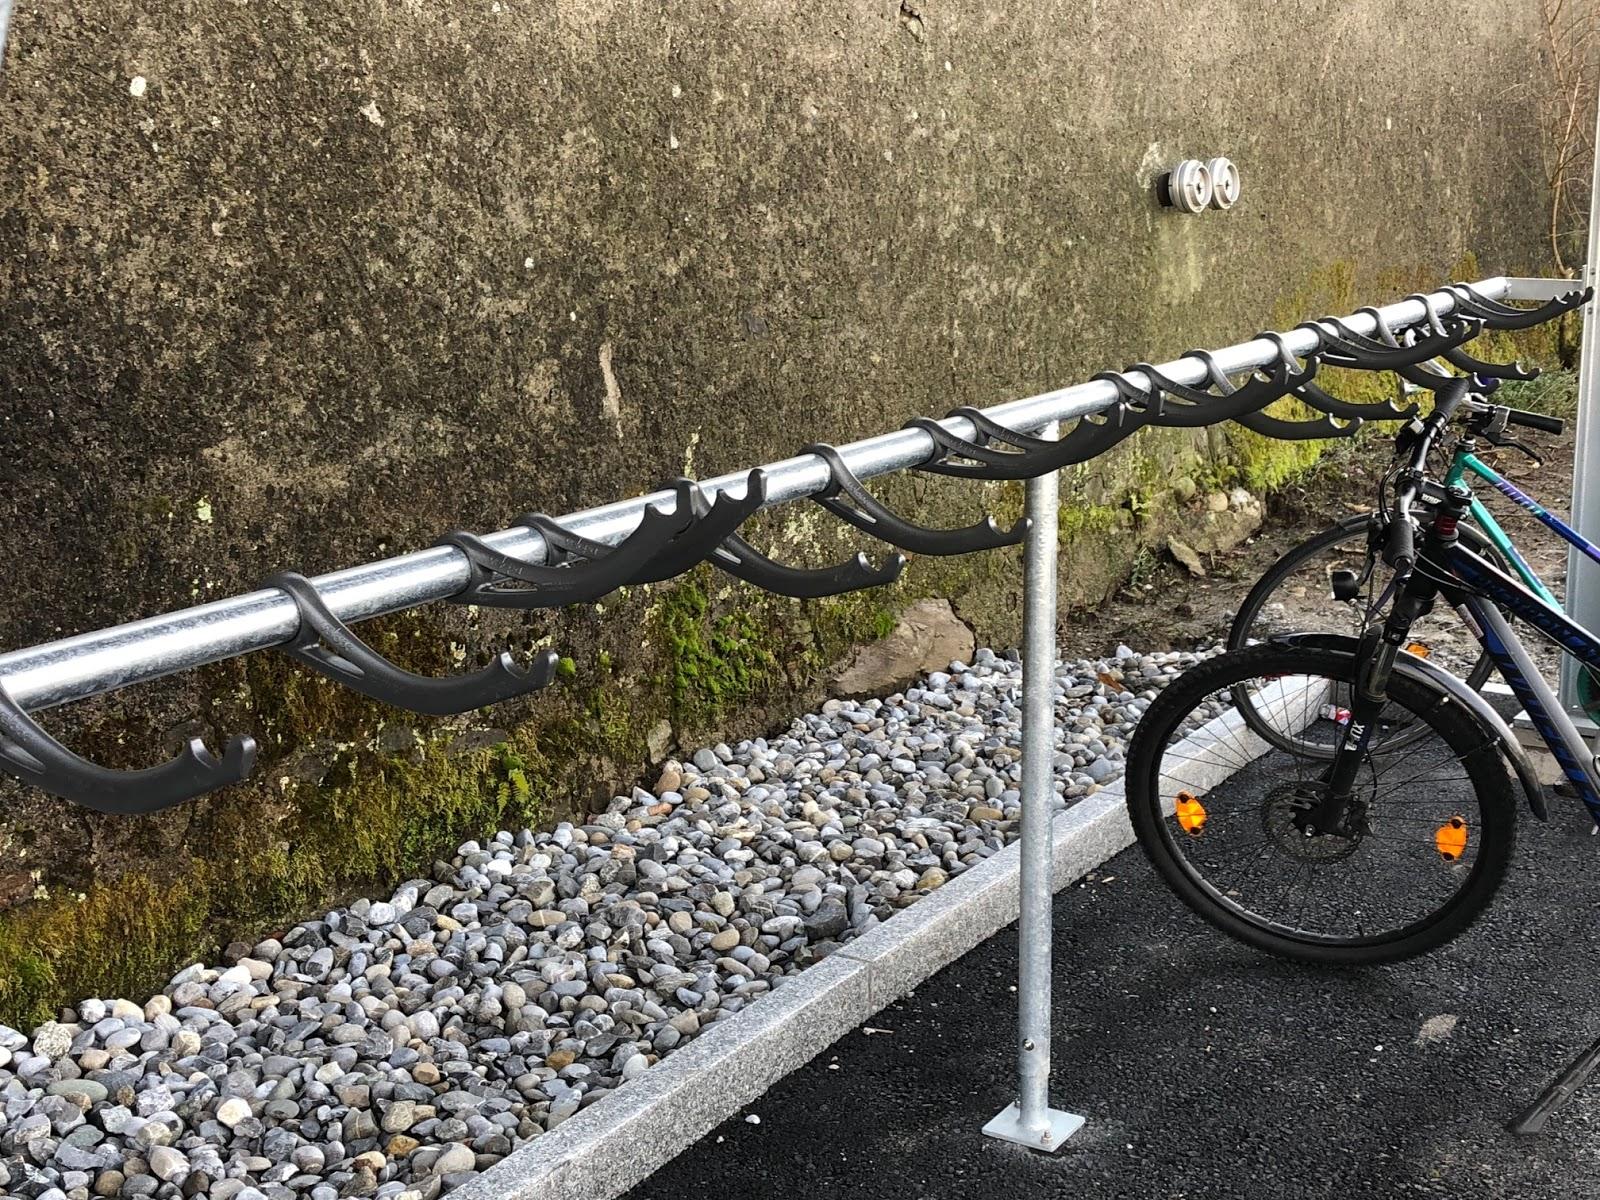 Fahrradunterstand | Schibler Metallbauteile